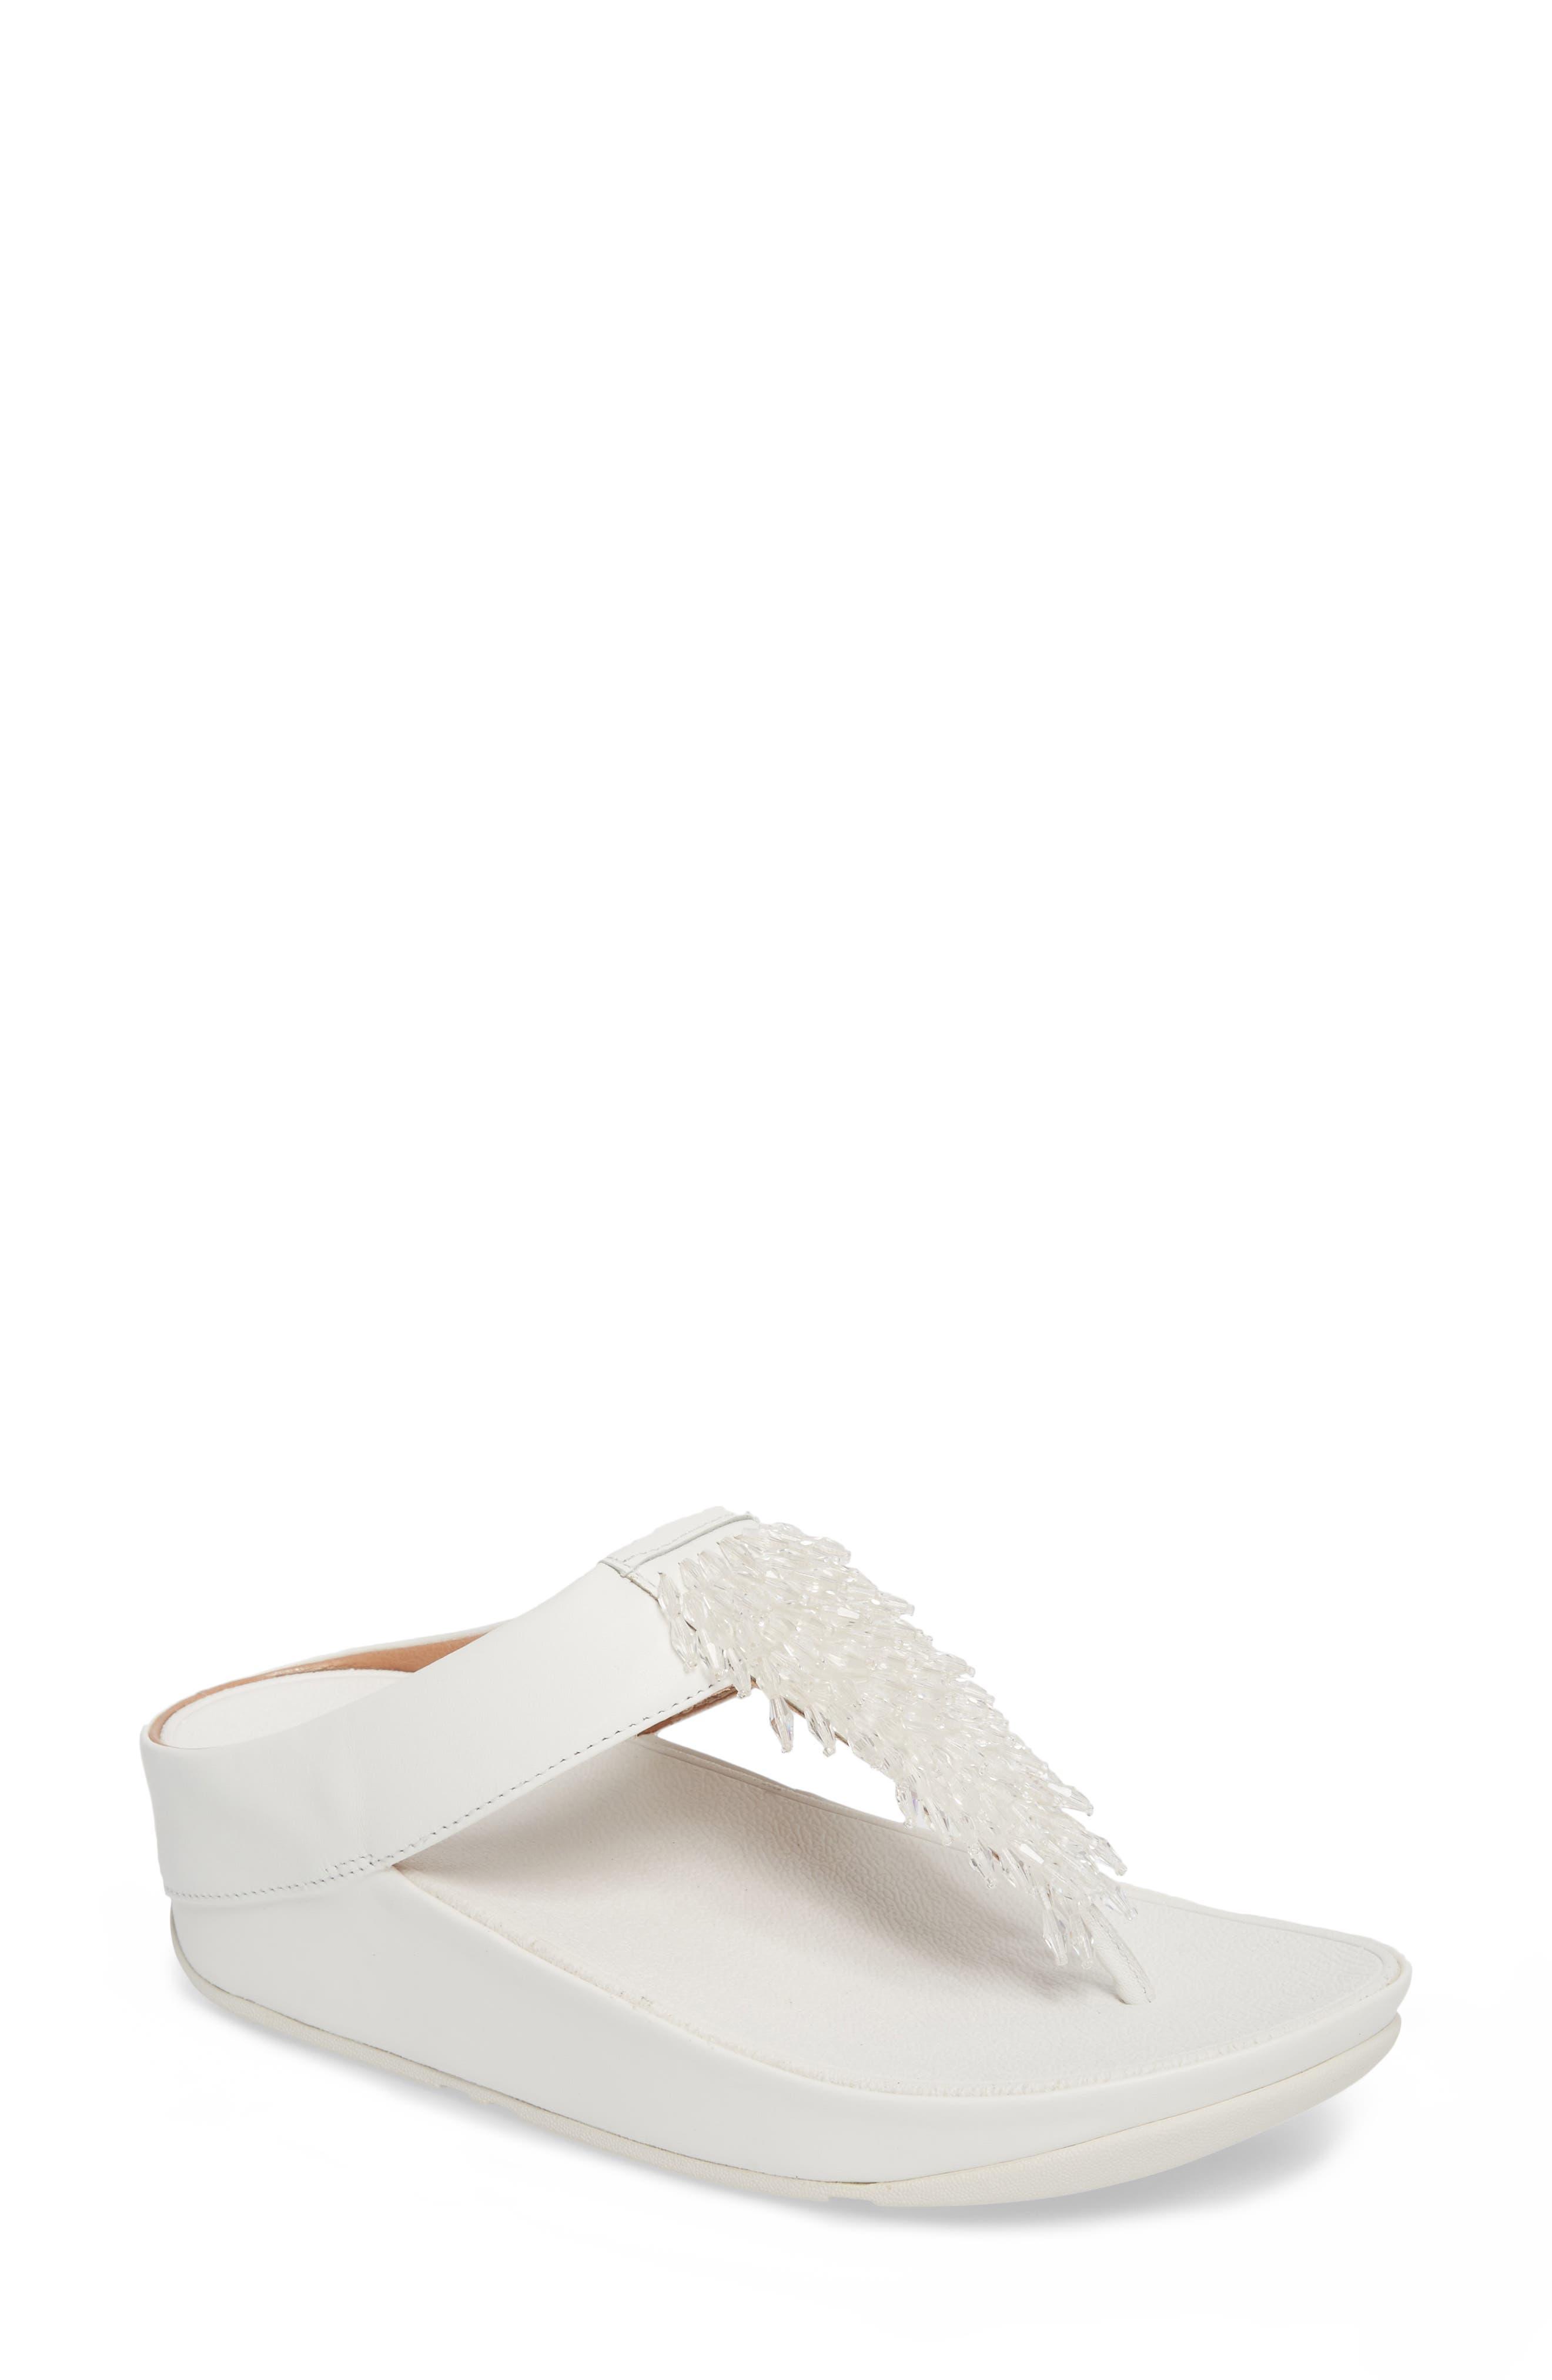 Rumba Sandal,                             Main thumbnail 1, color,                             Urban White Leather